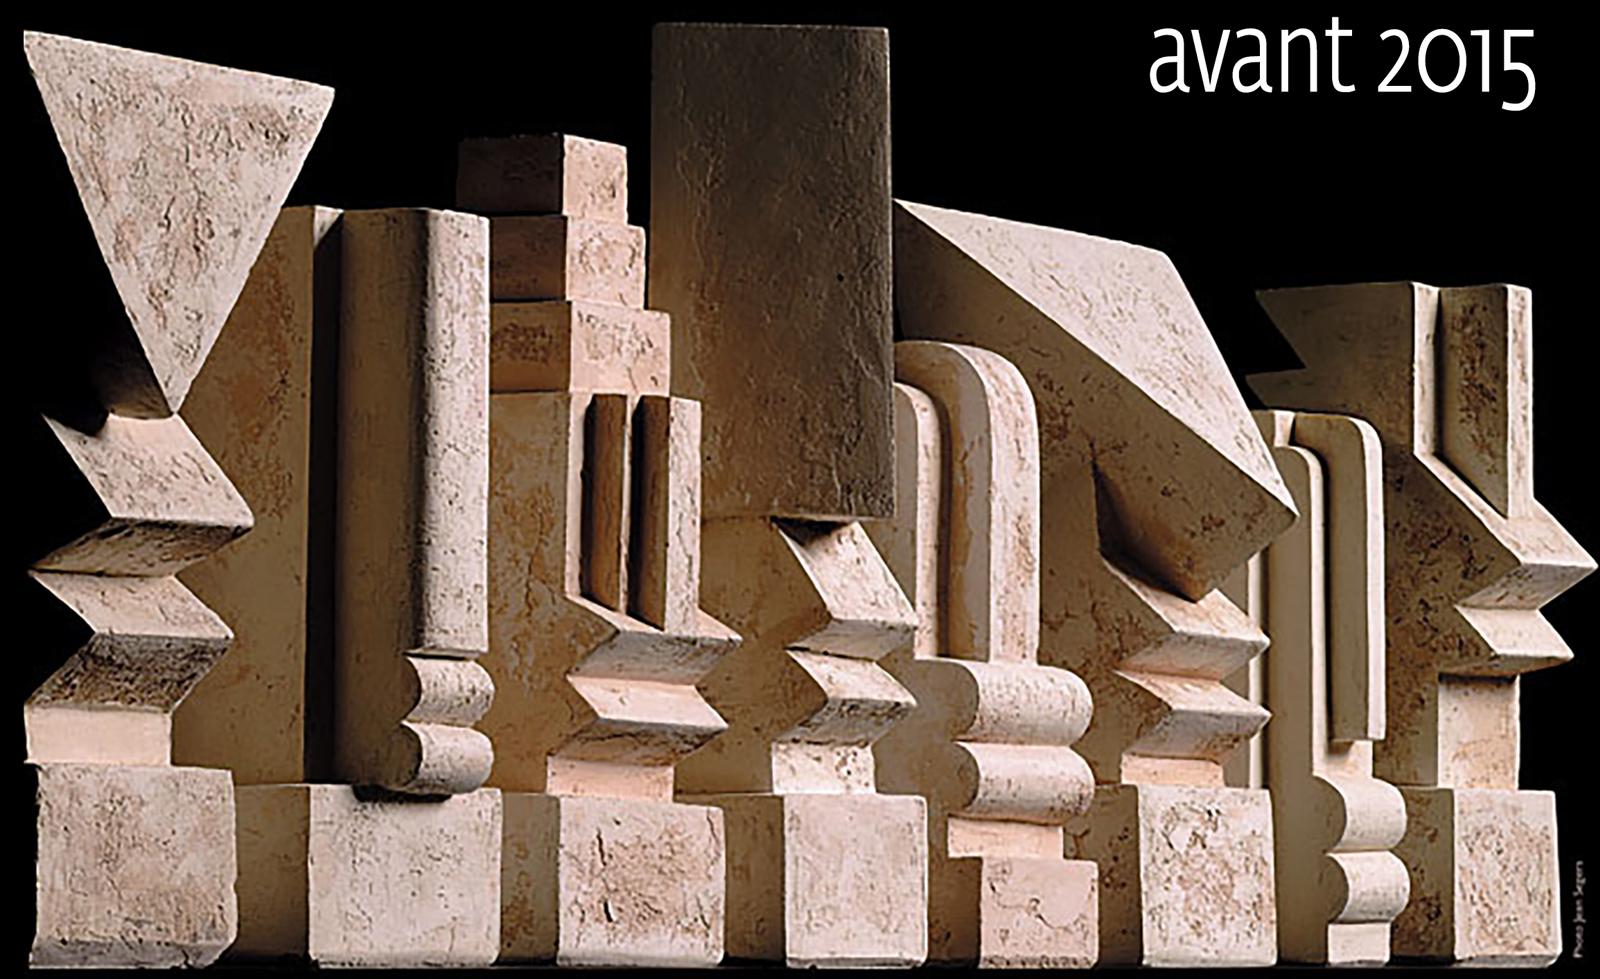 avant2015-1michel-michiels-scultures